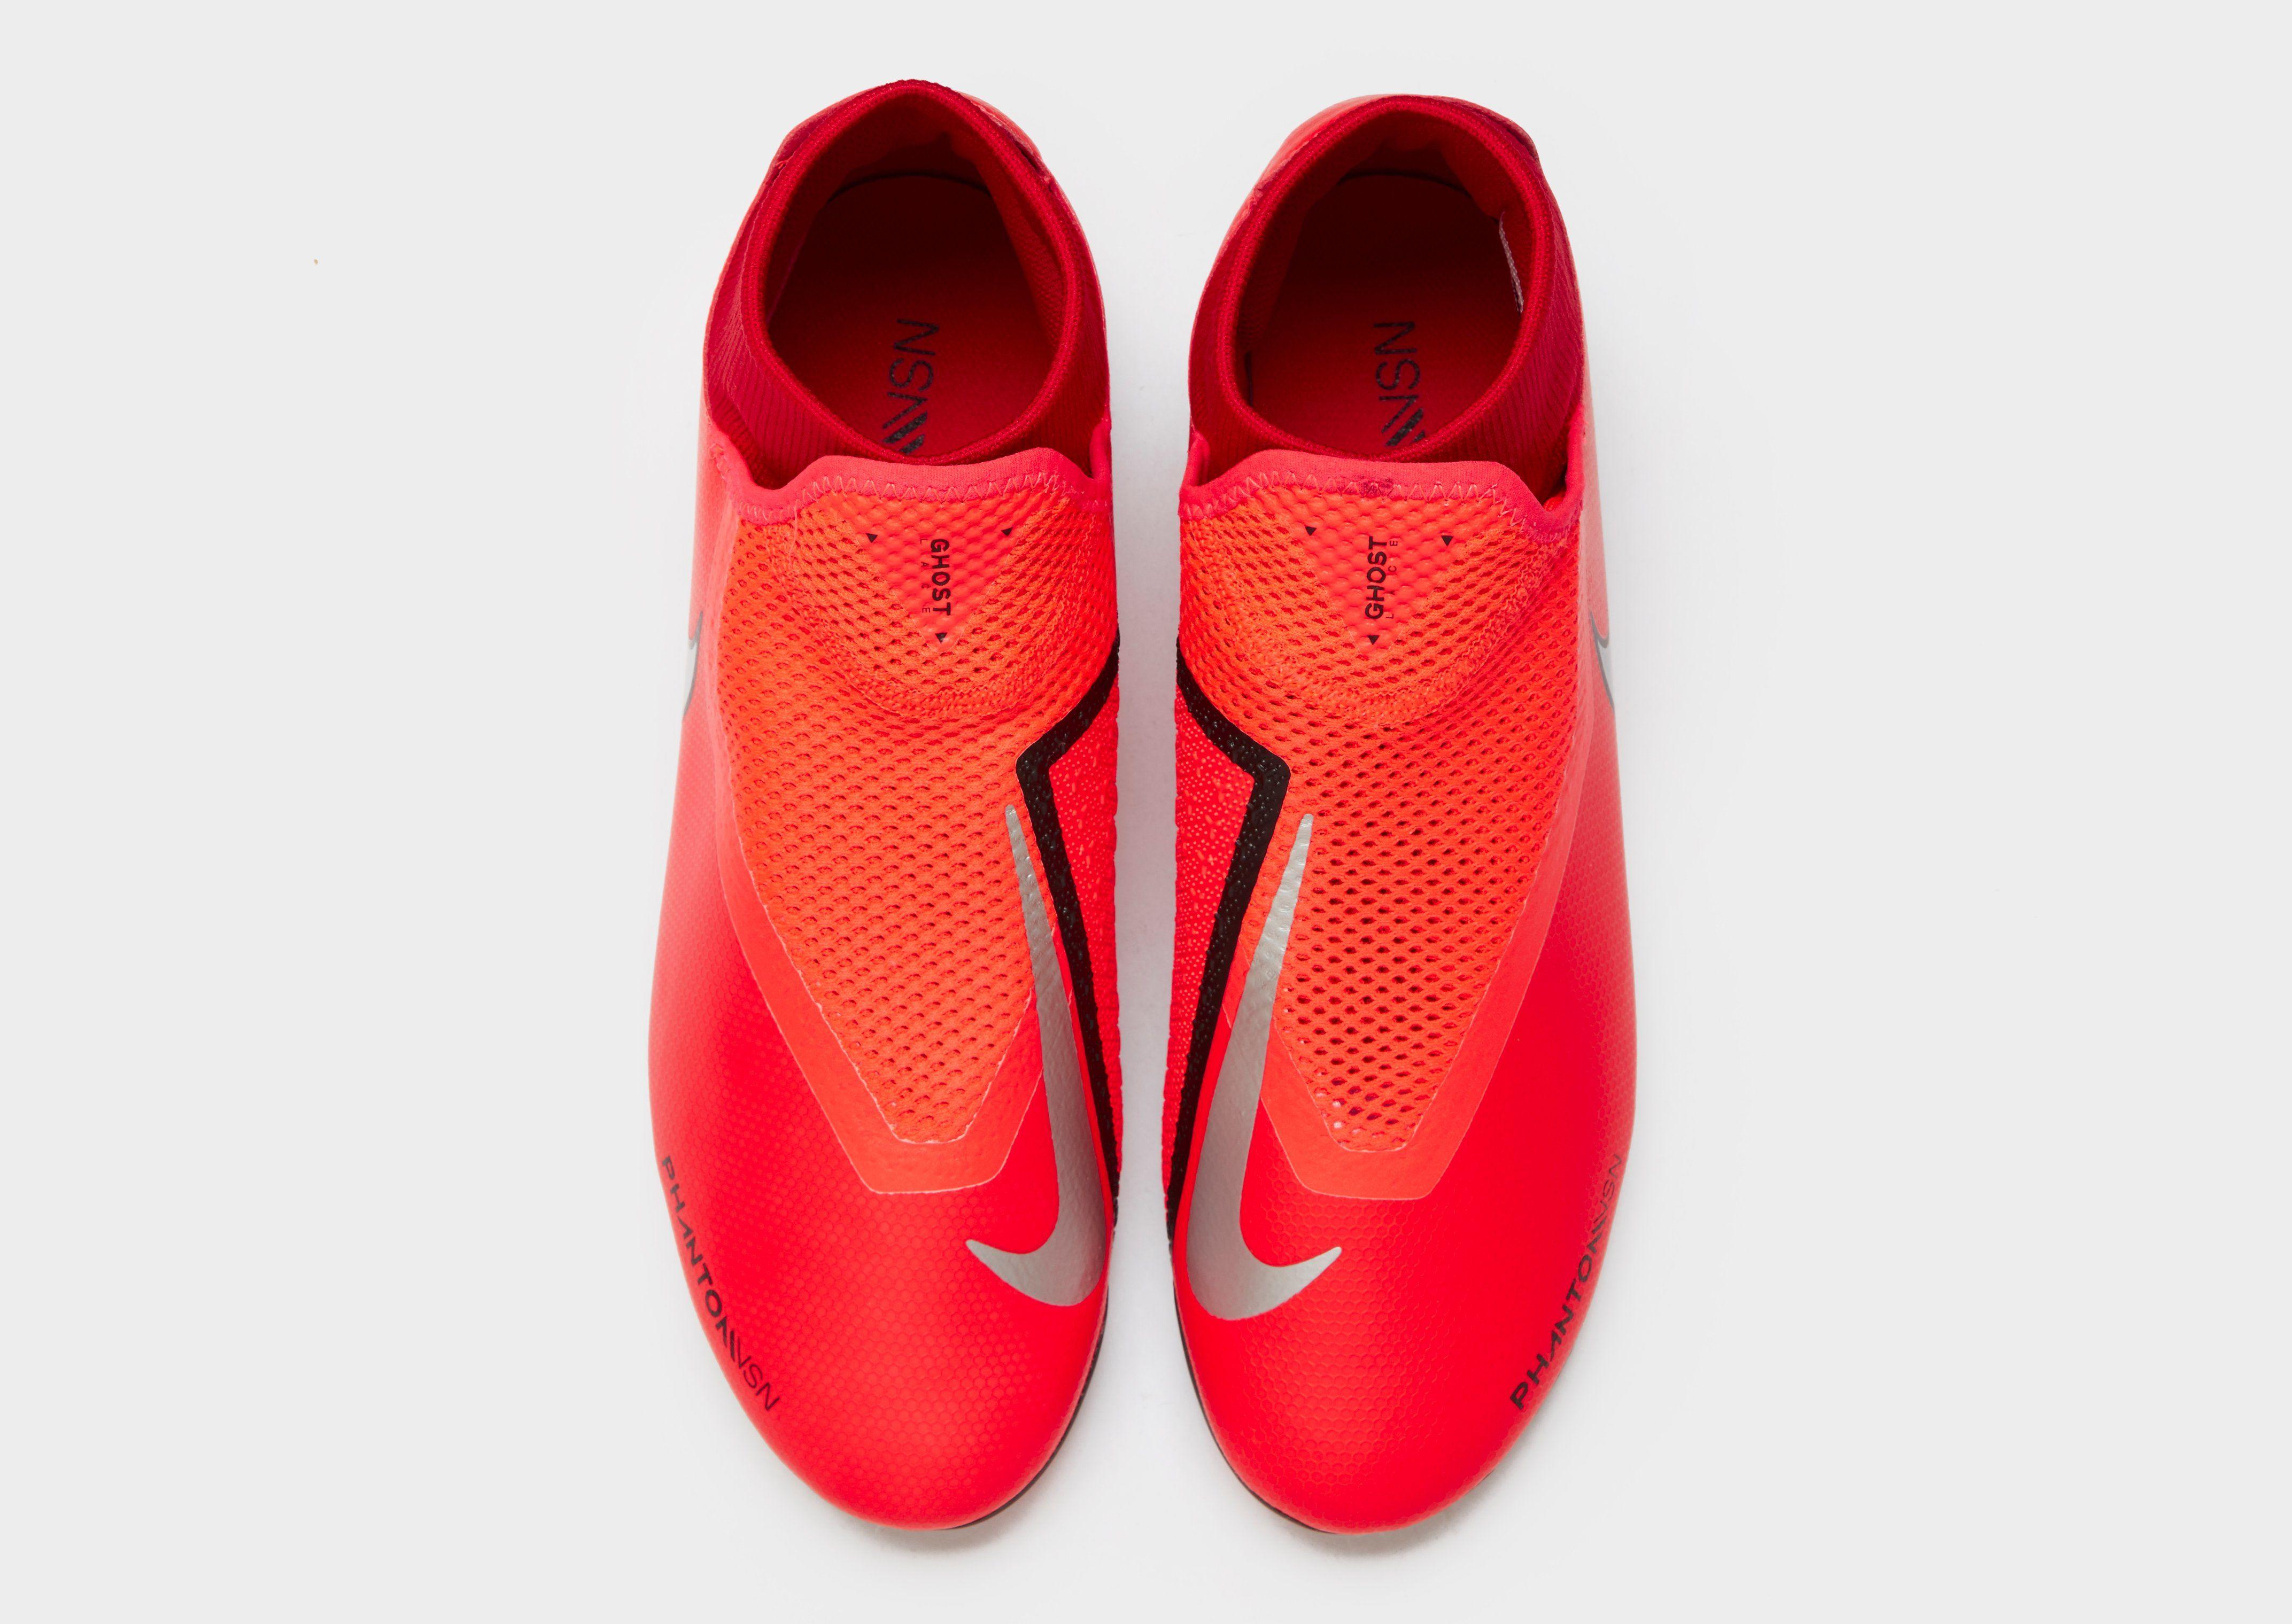 NIKE Nike Phantom Vision Academy Dynamic Fit MG Multi-Ground Football Boot